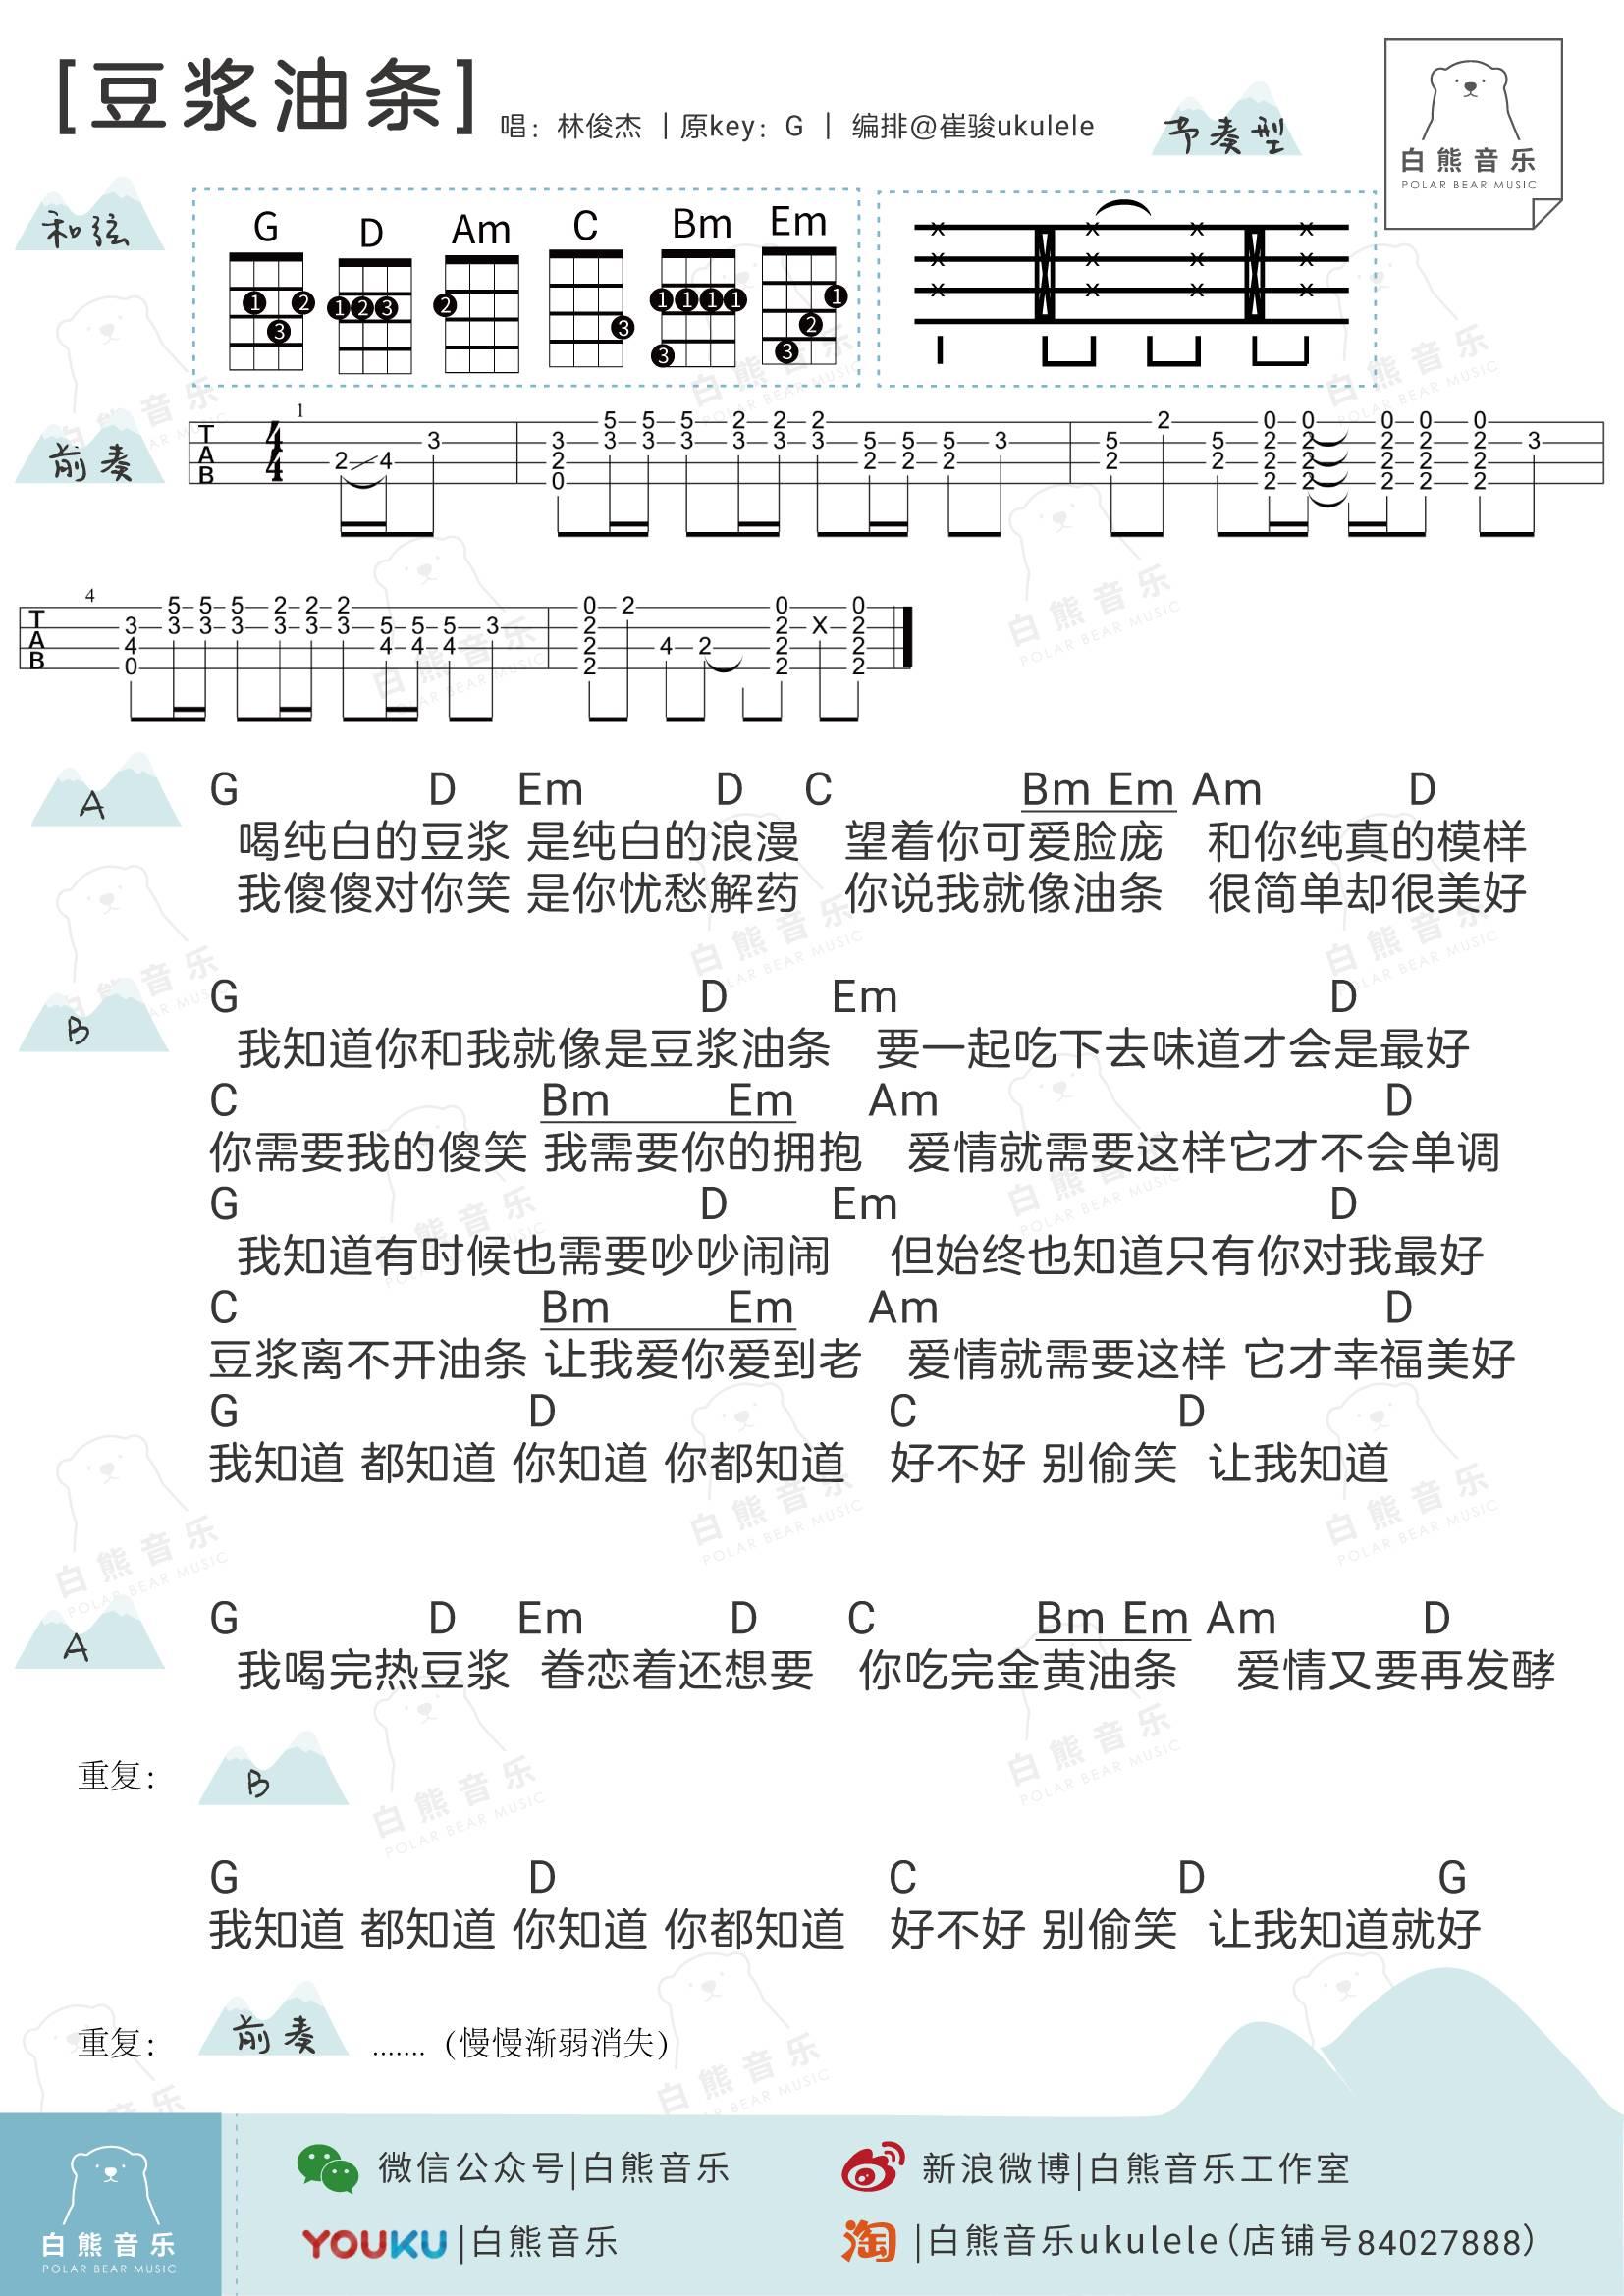 豆浆油条 林俊杰 ukulele谱